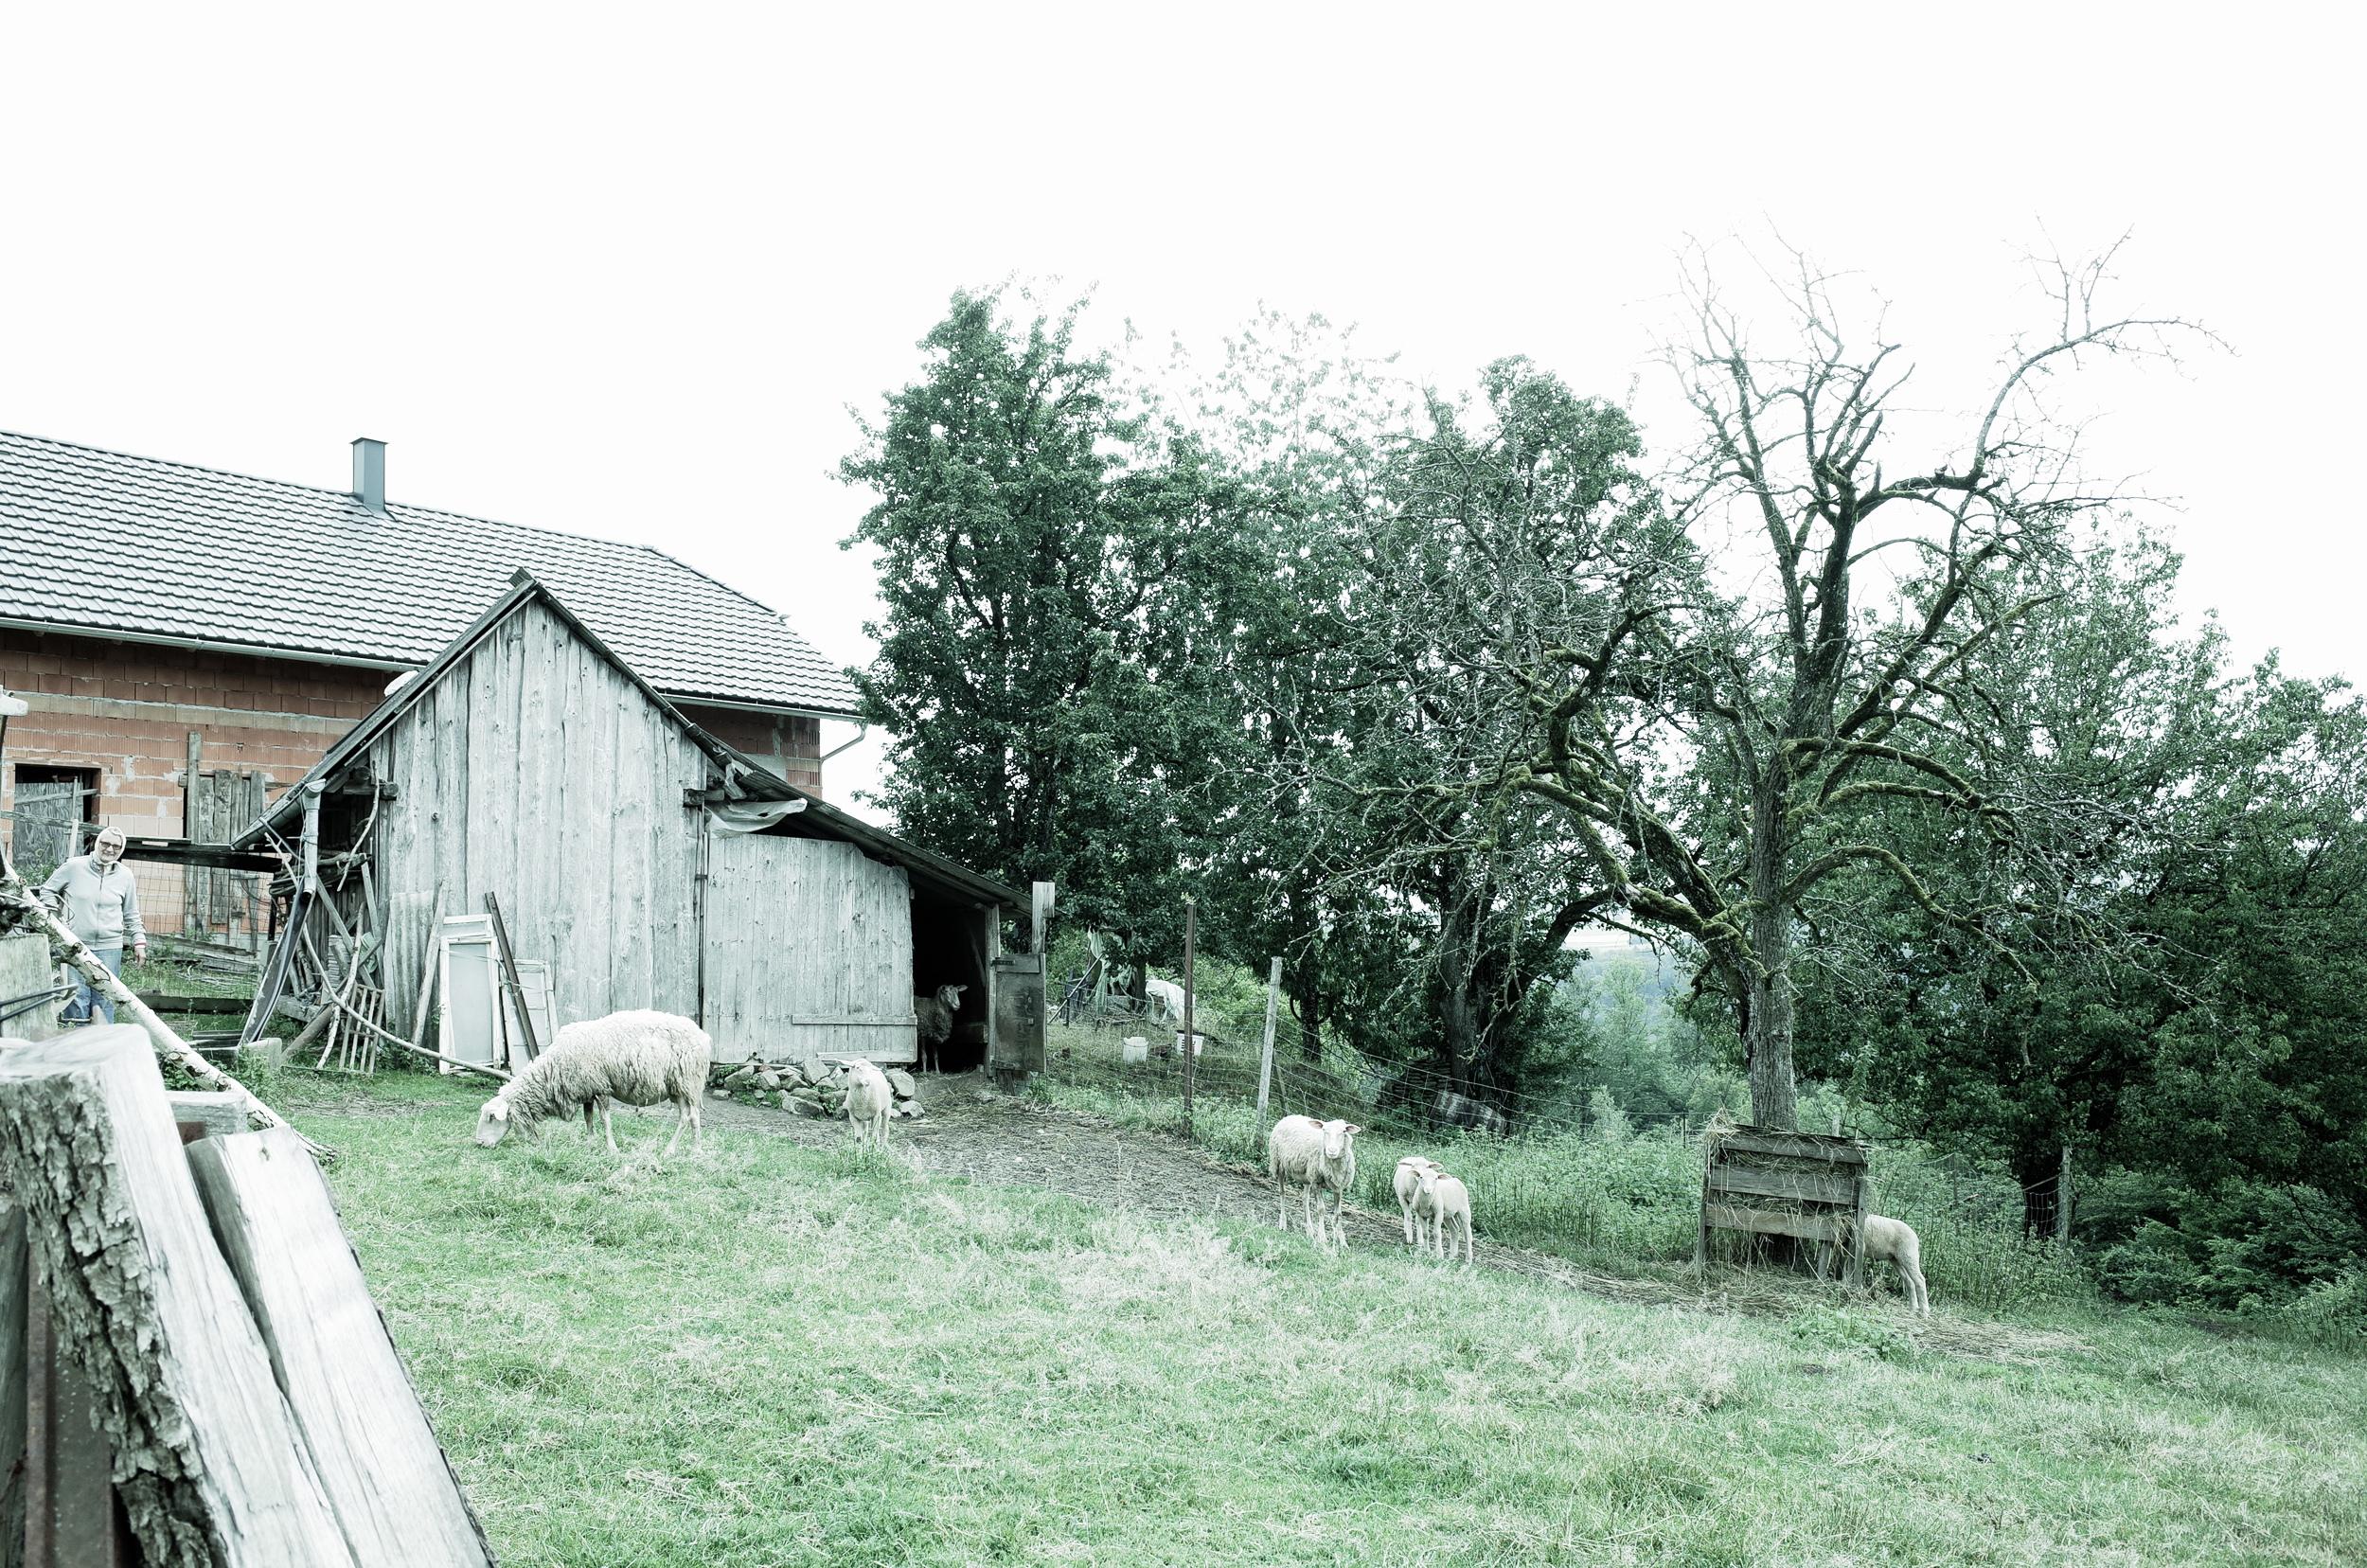 Granitpilgern Schafe